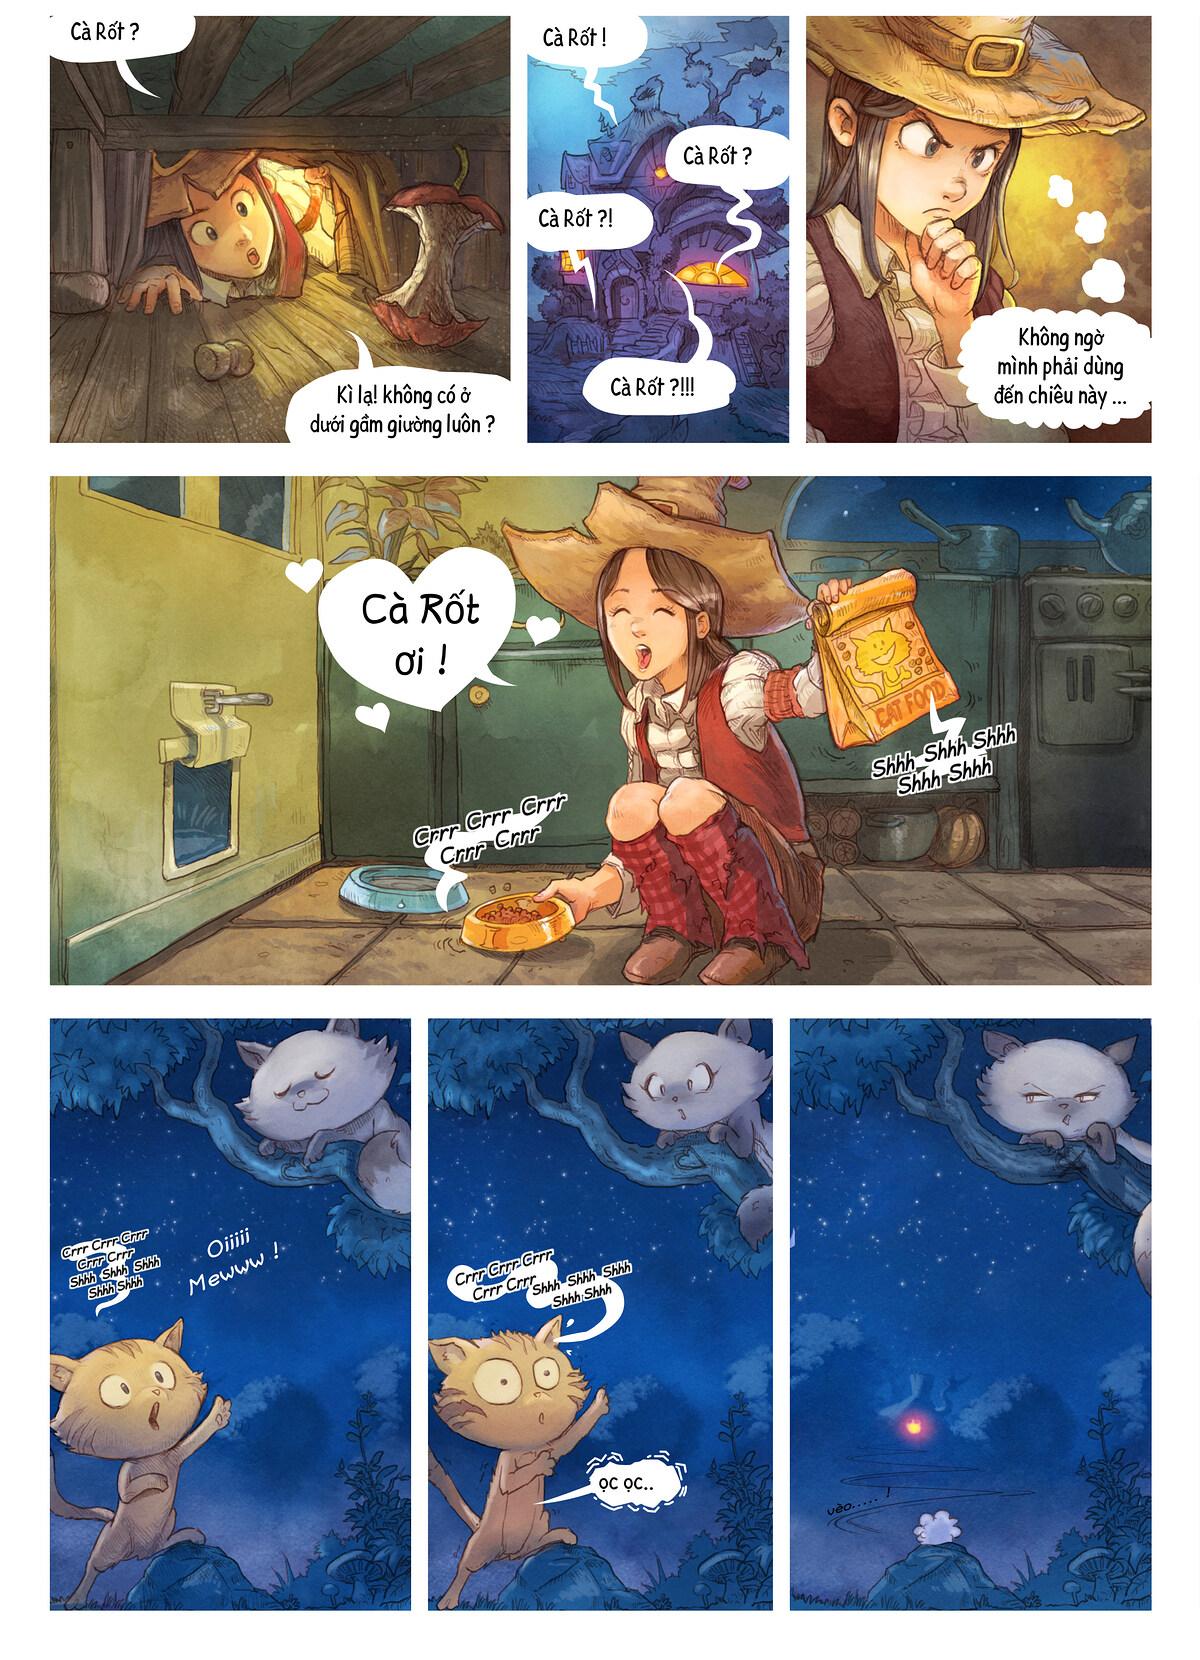 A webcomic page of Pepper&Carrot, Tập 4 [vi], trang 2